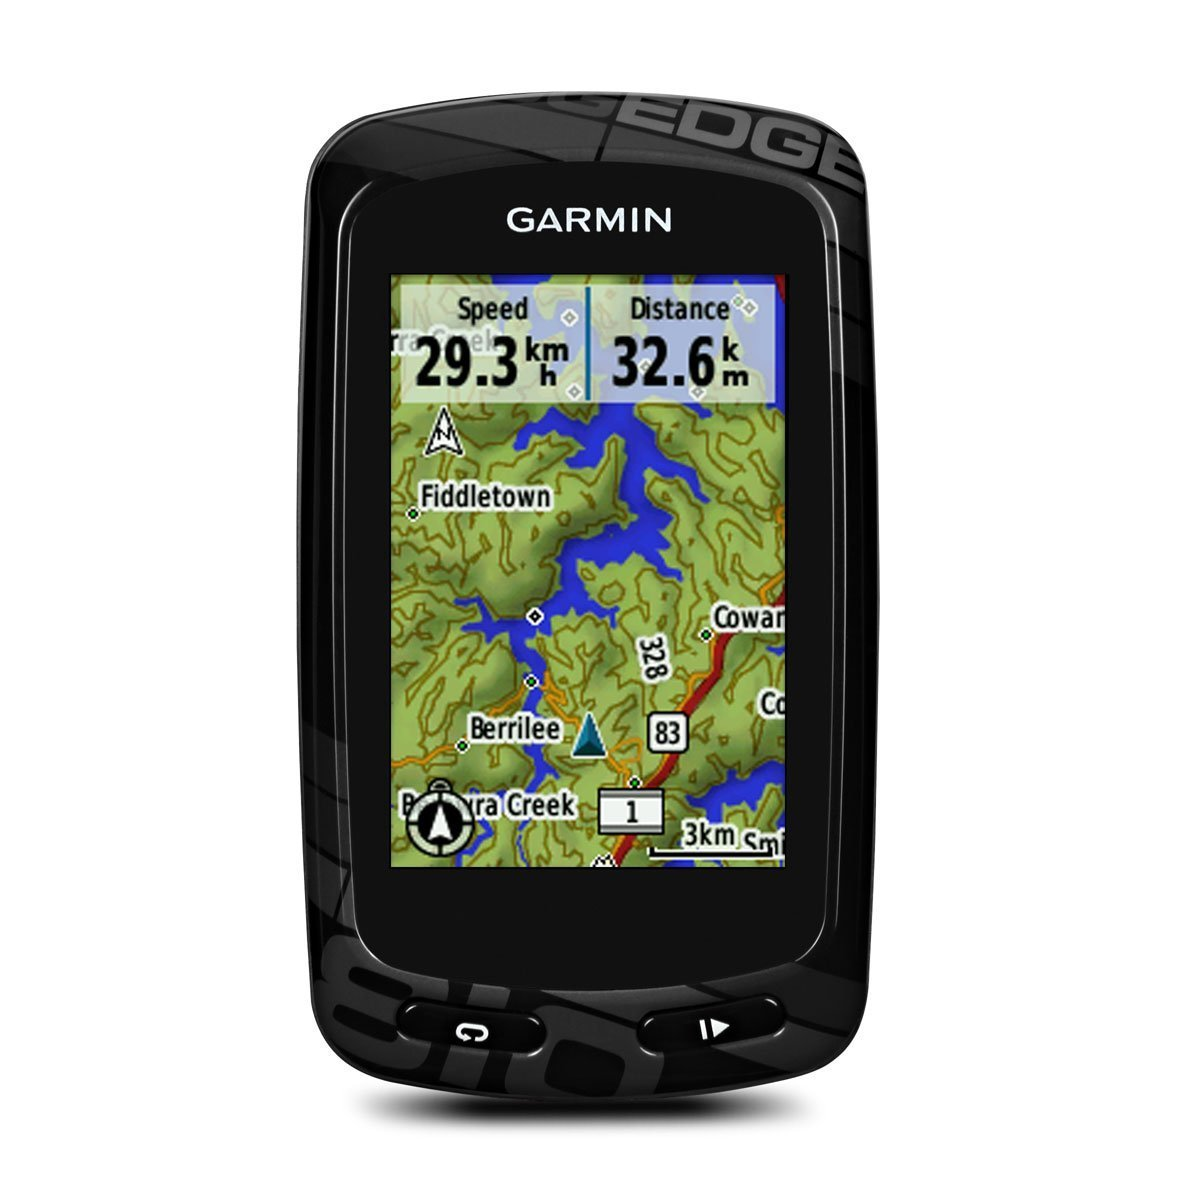 Garmin – Garmin edge 810 bundle (puls + kadance + kort) på billigsport24